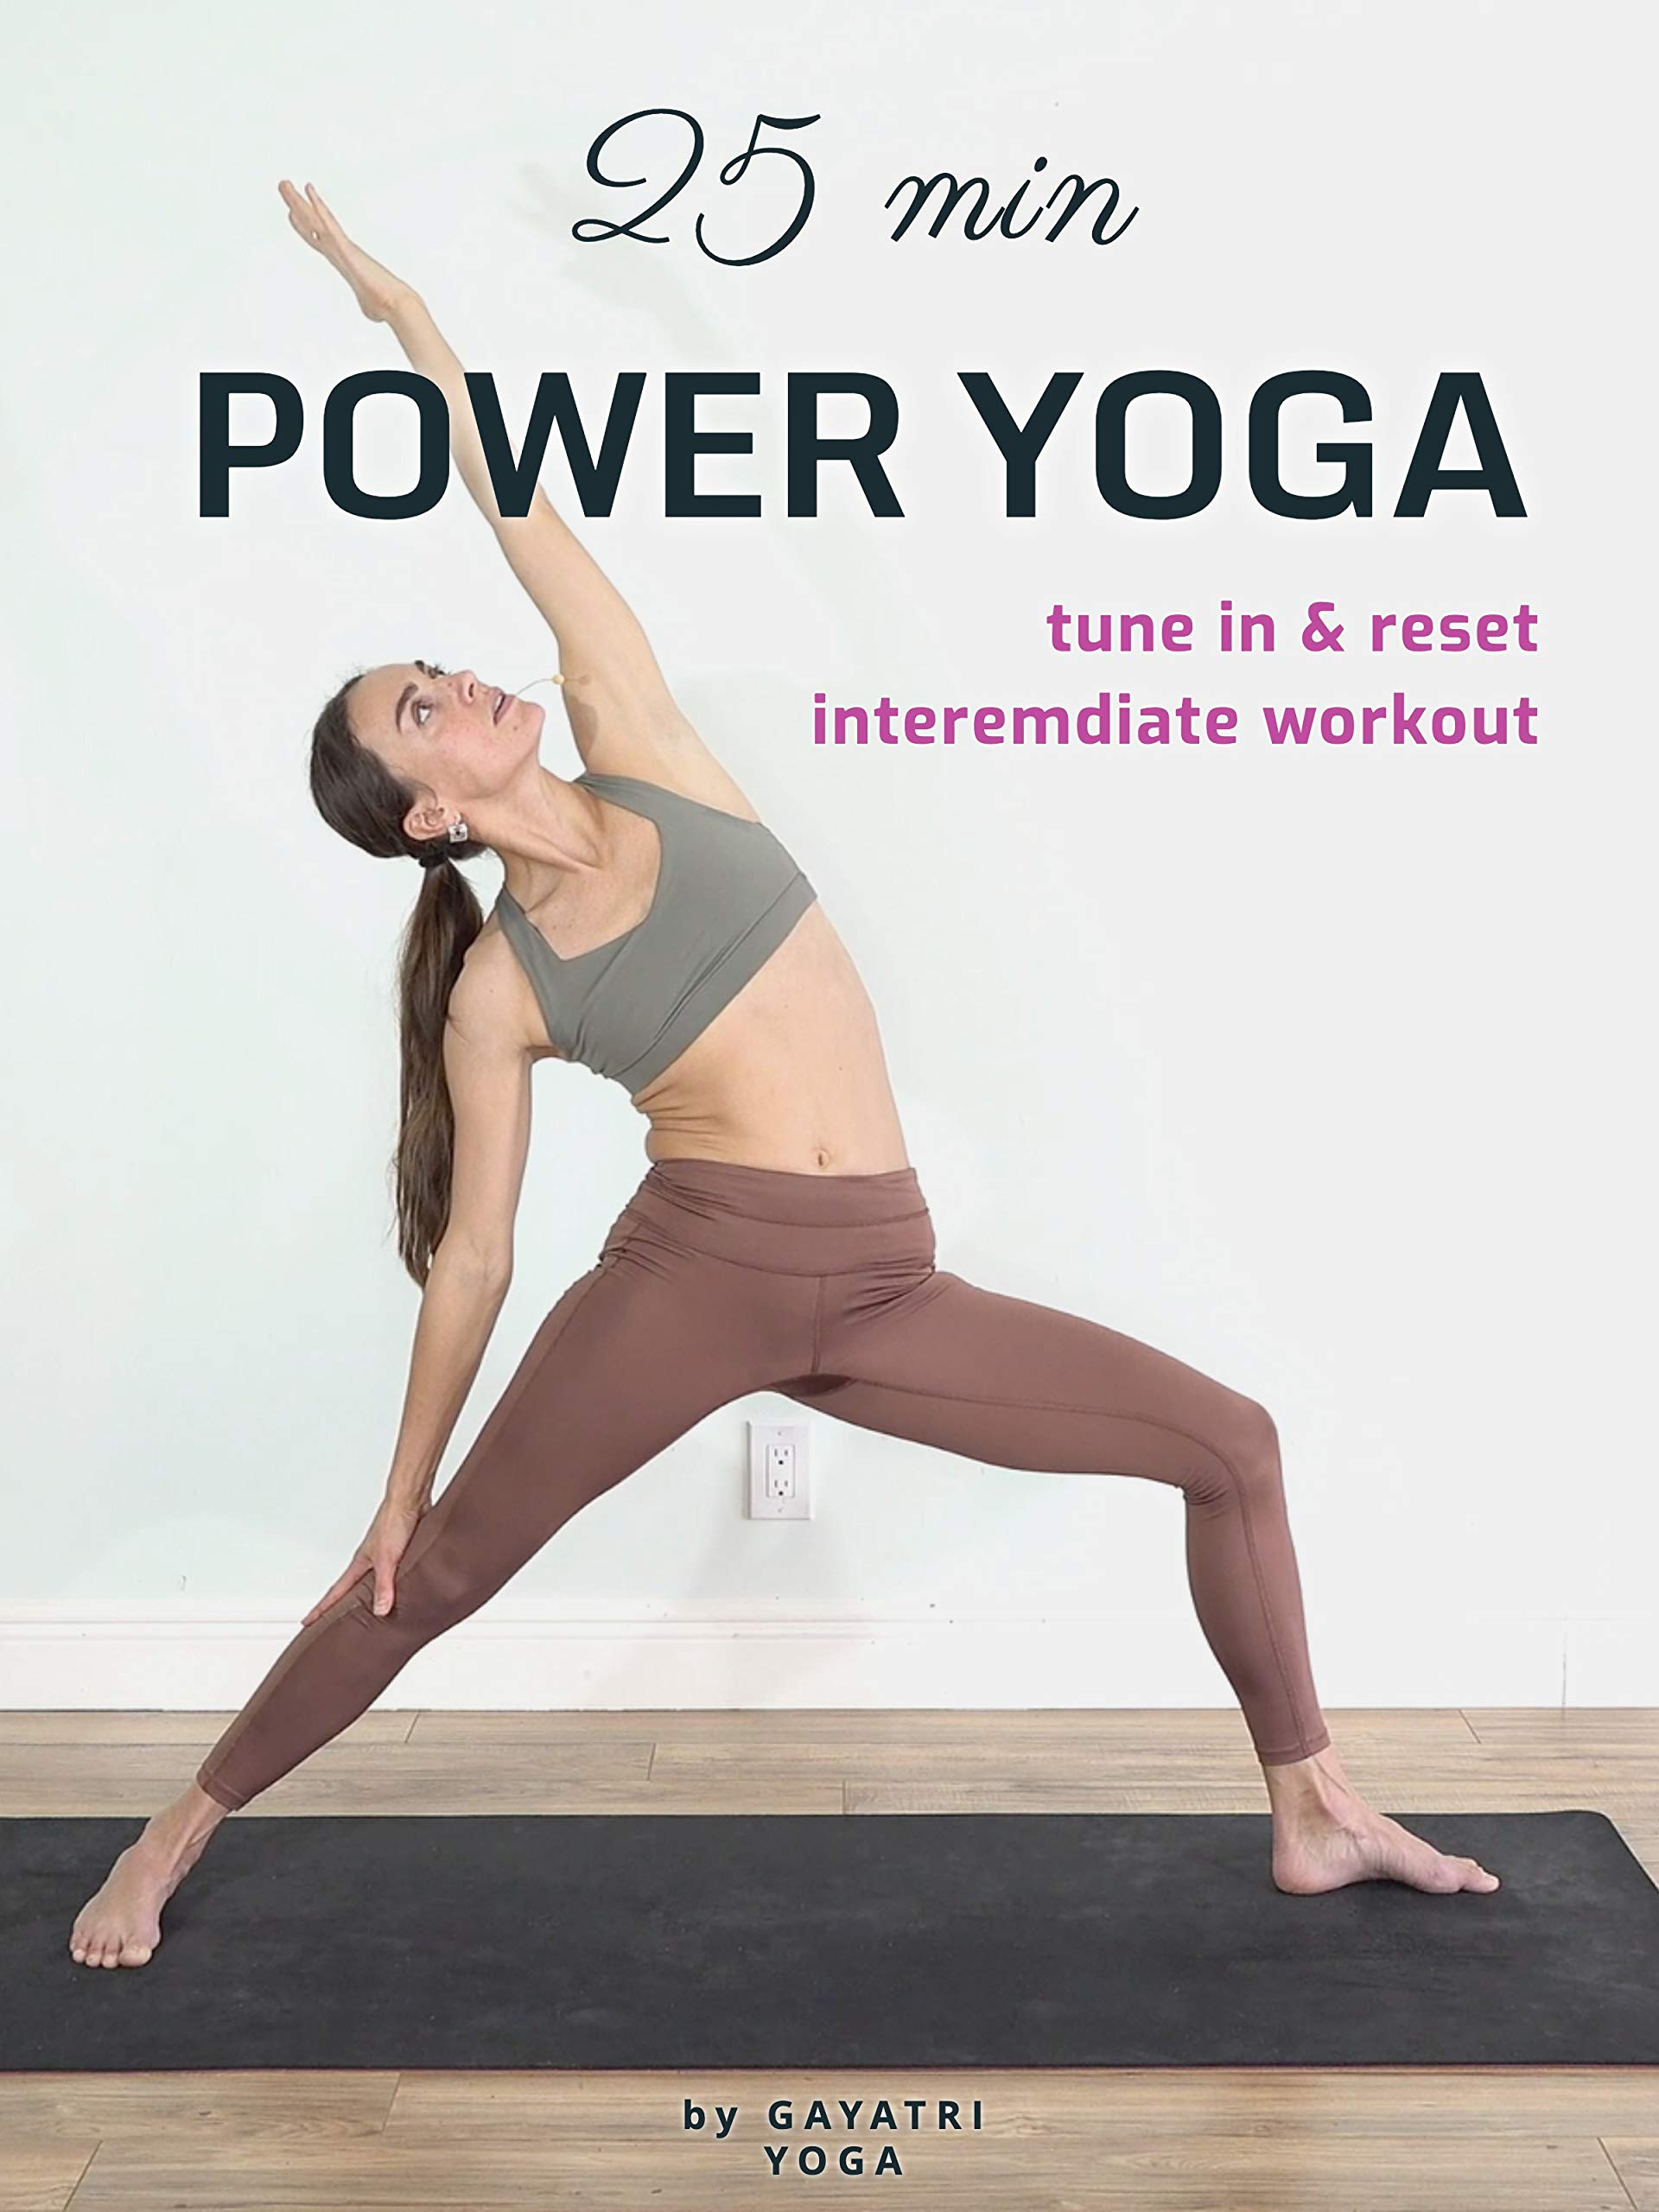 25 Min Power Yoga - Tune In & Reset Intermediate Workout - Gayatri Yoga